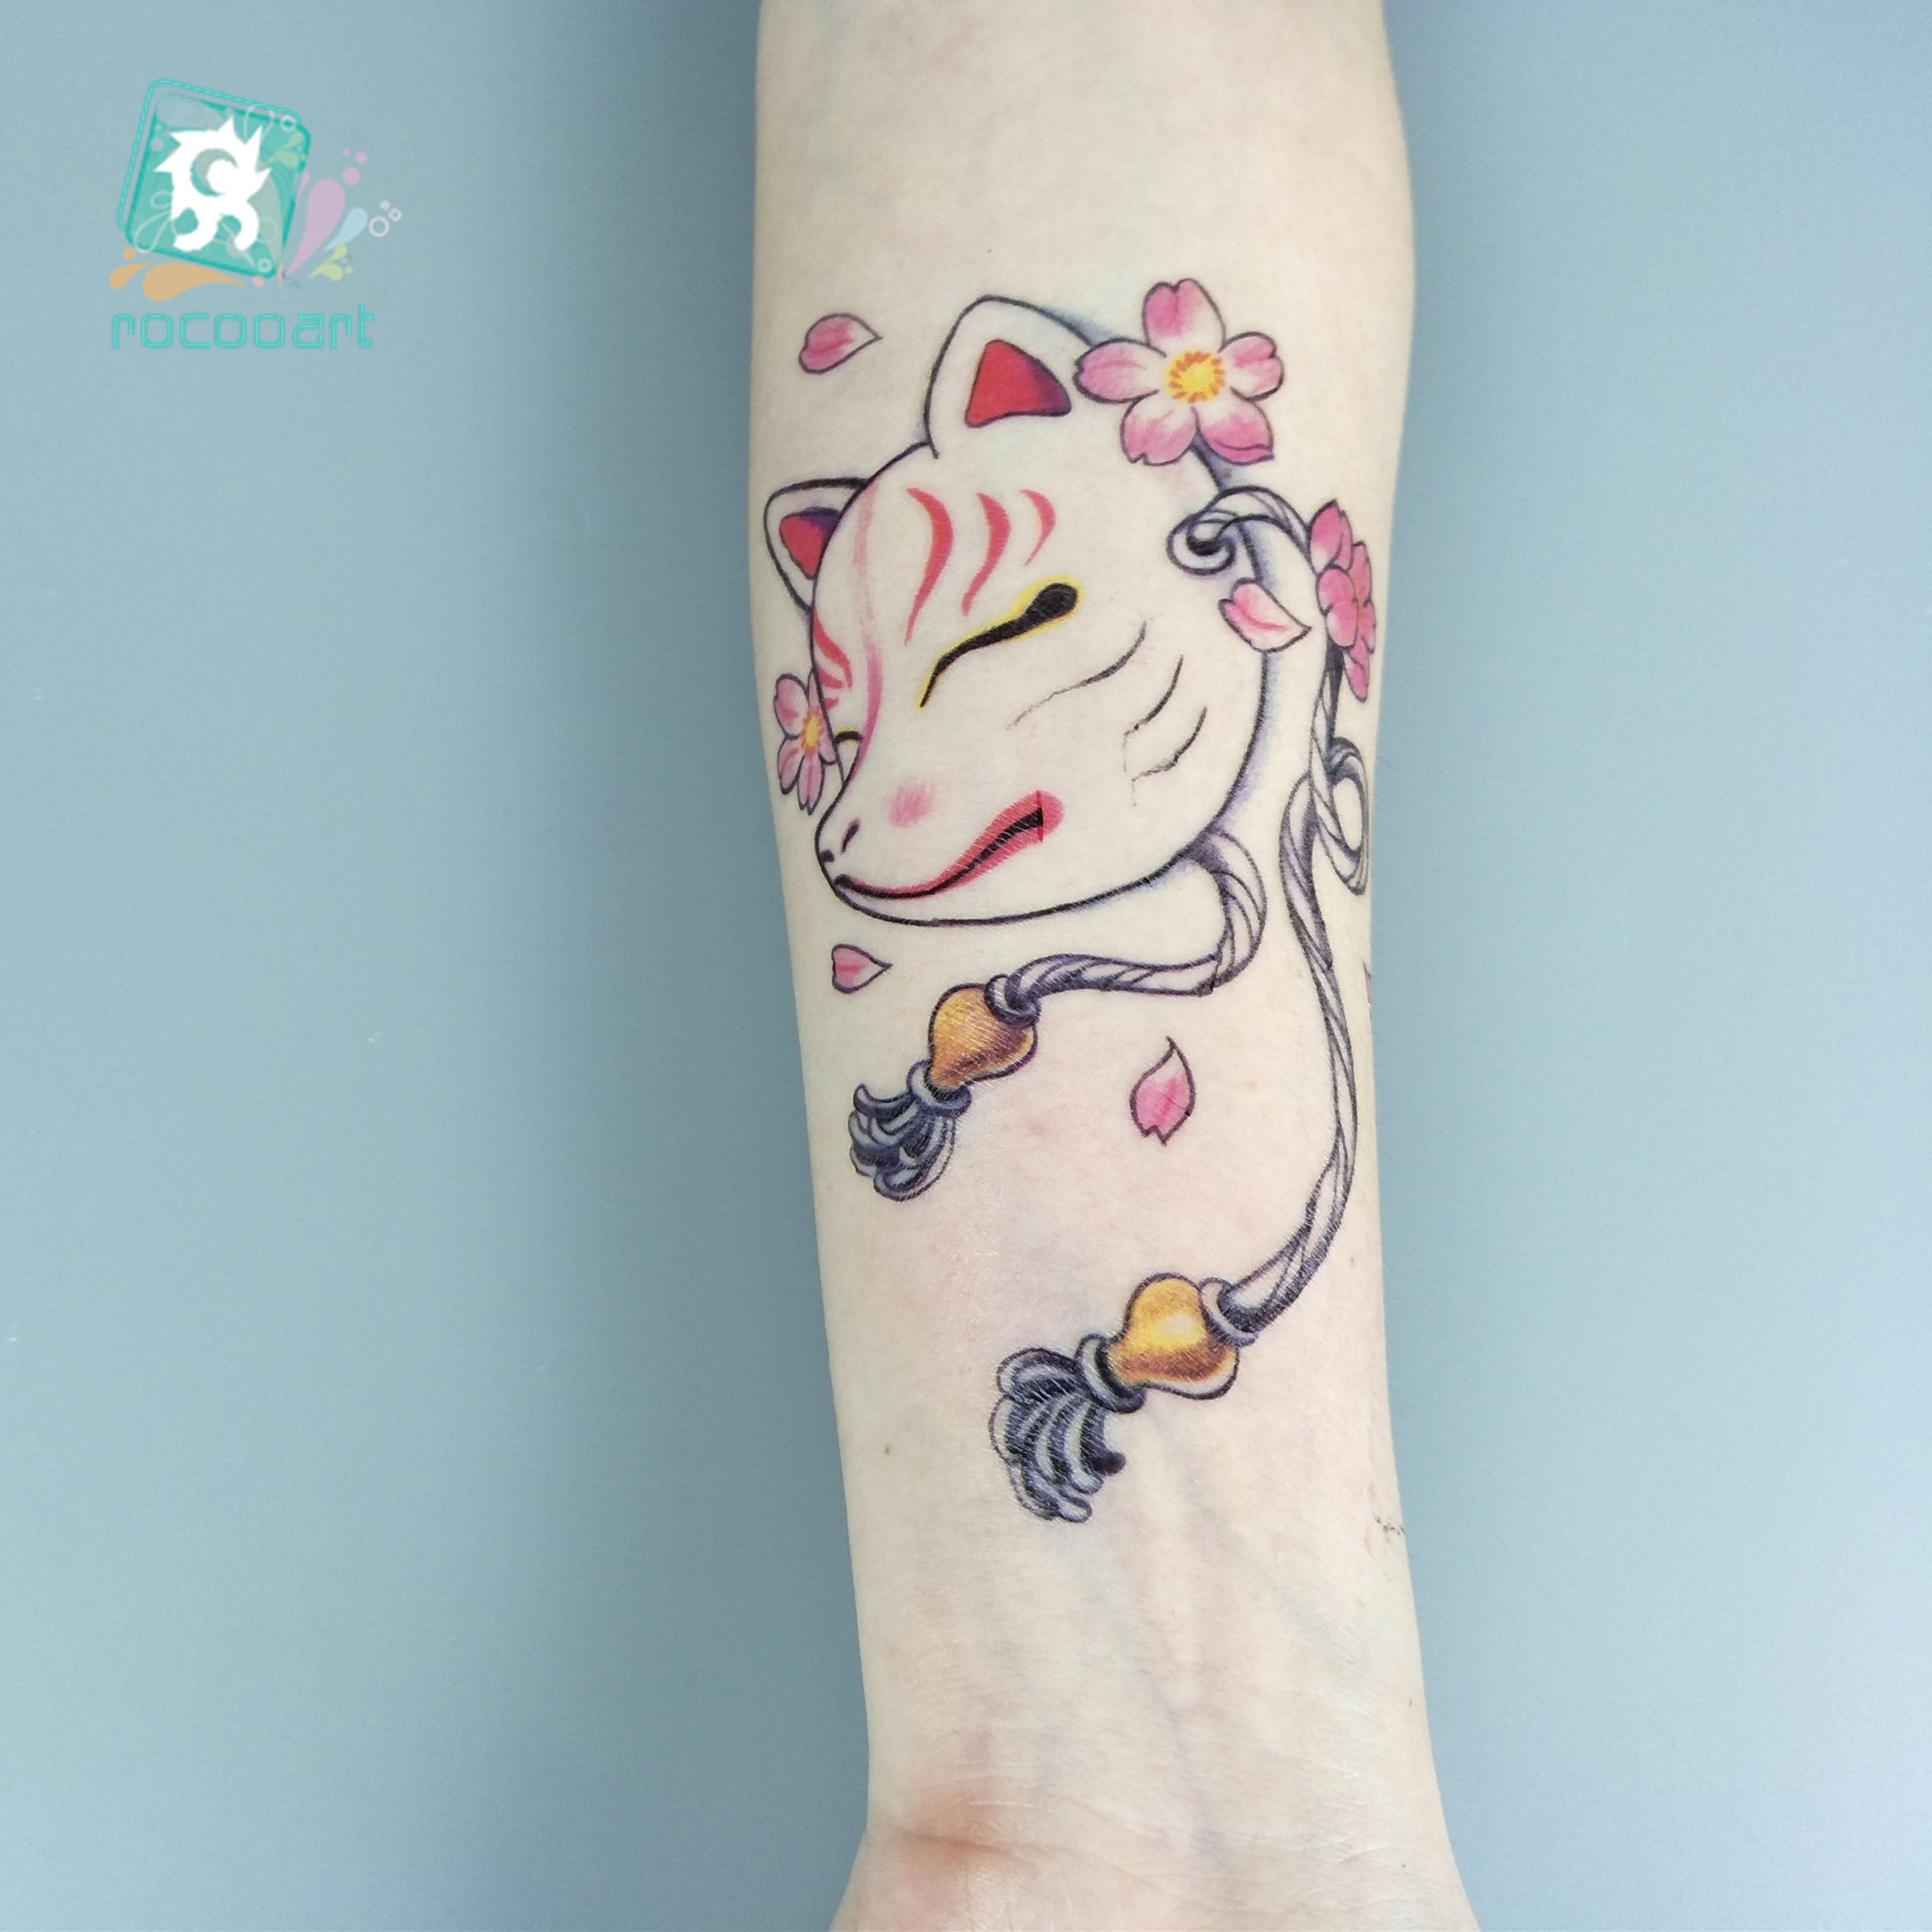 Rocooart SC-593 Japanese Style Cats Face Mask Design Temporary Body Art Fake Taty Mid Size Water Transfer Tattoo Sticker